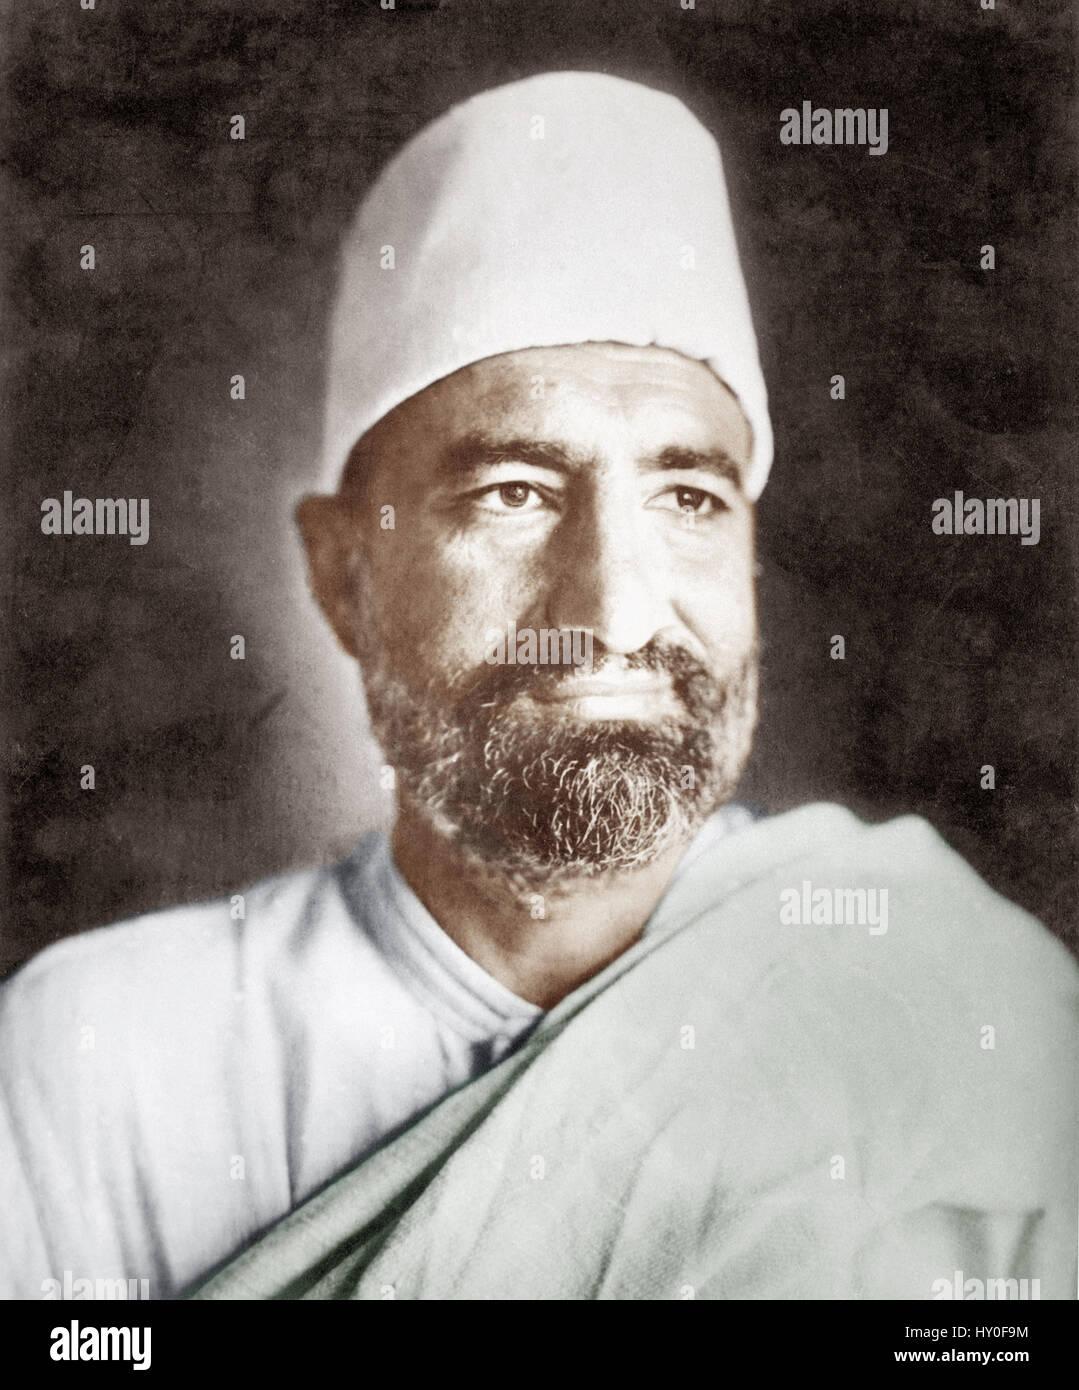 Indian freedom fighter, khan abdul ghaffar khan, india, asia, 1930 - Stock Image